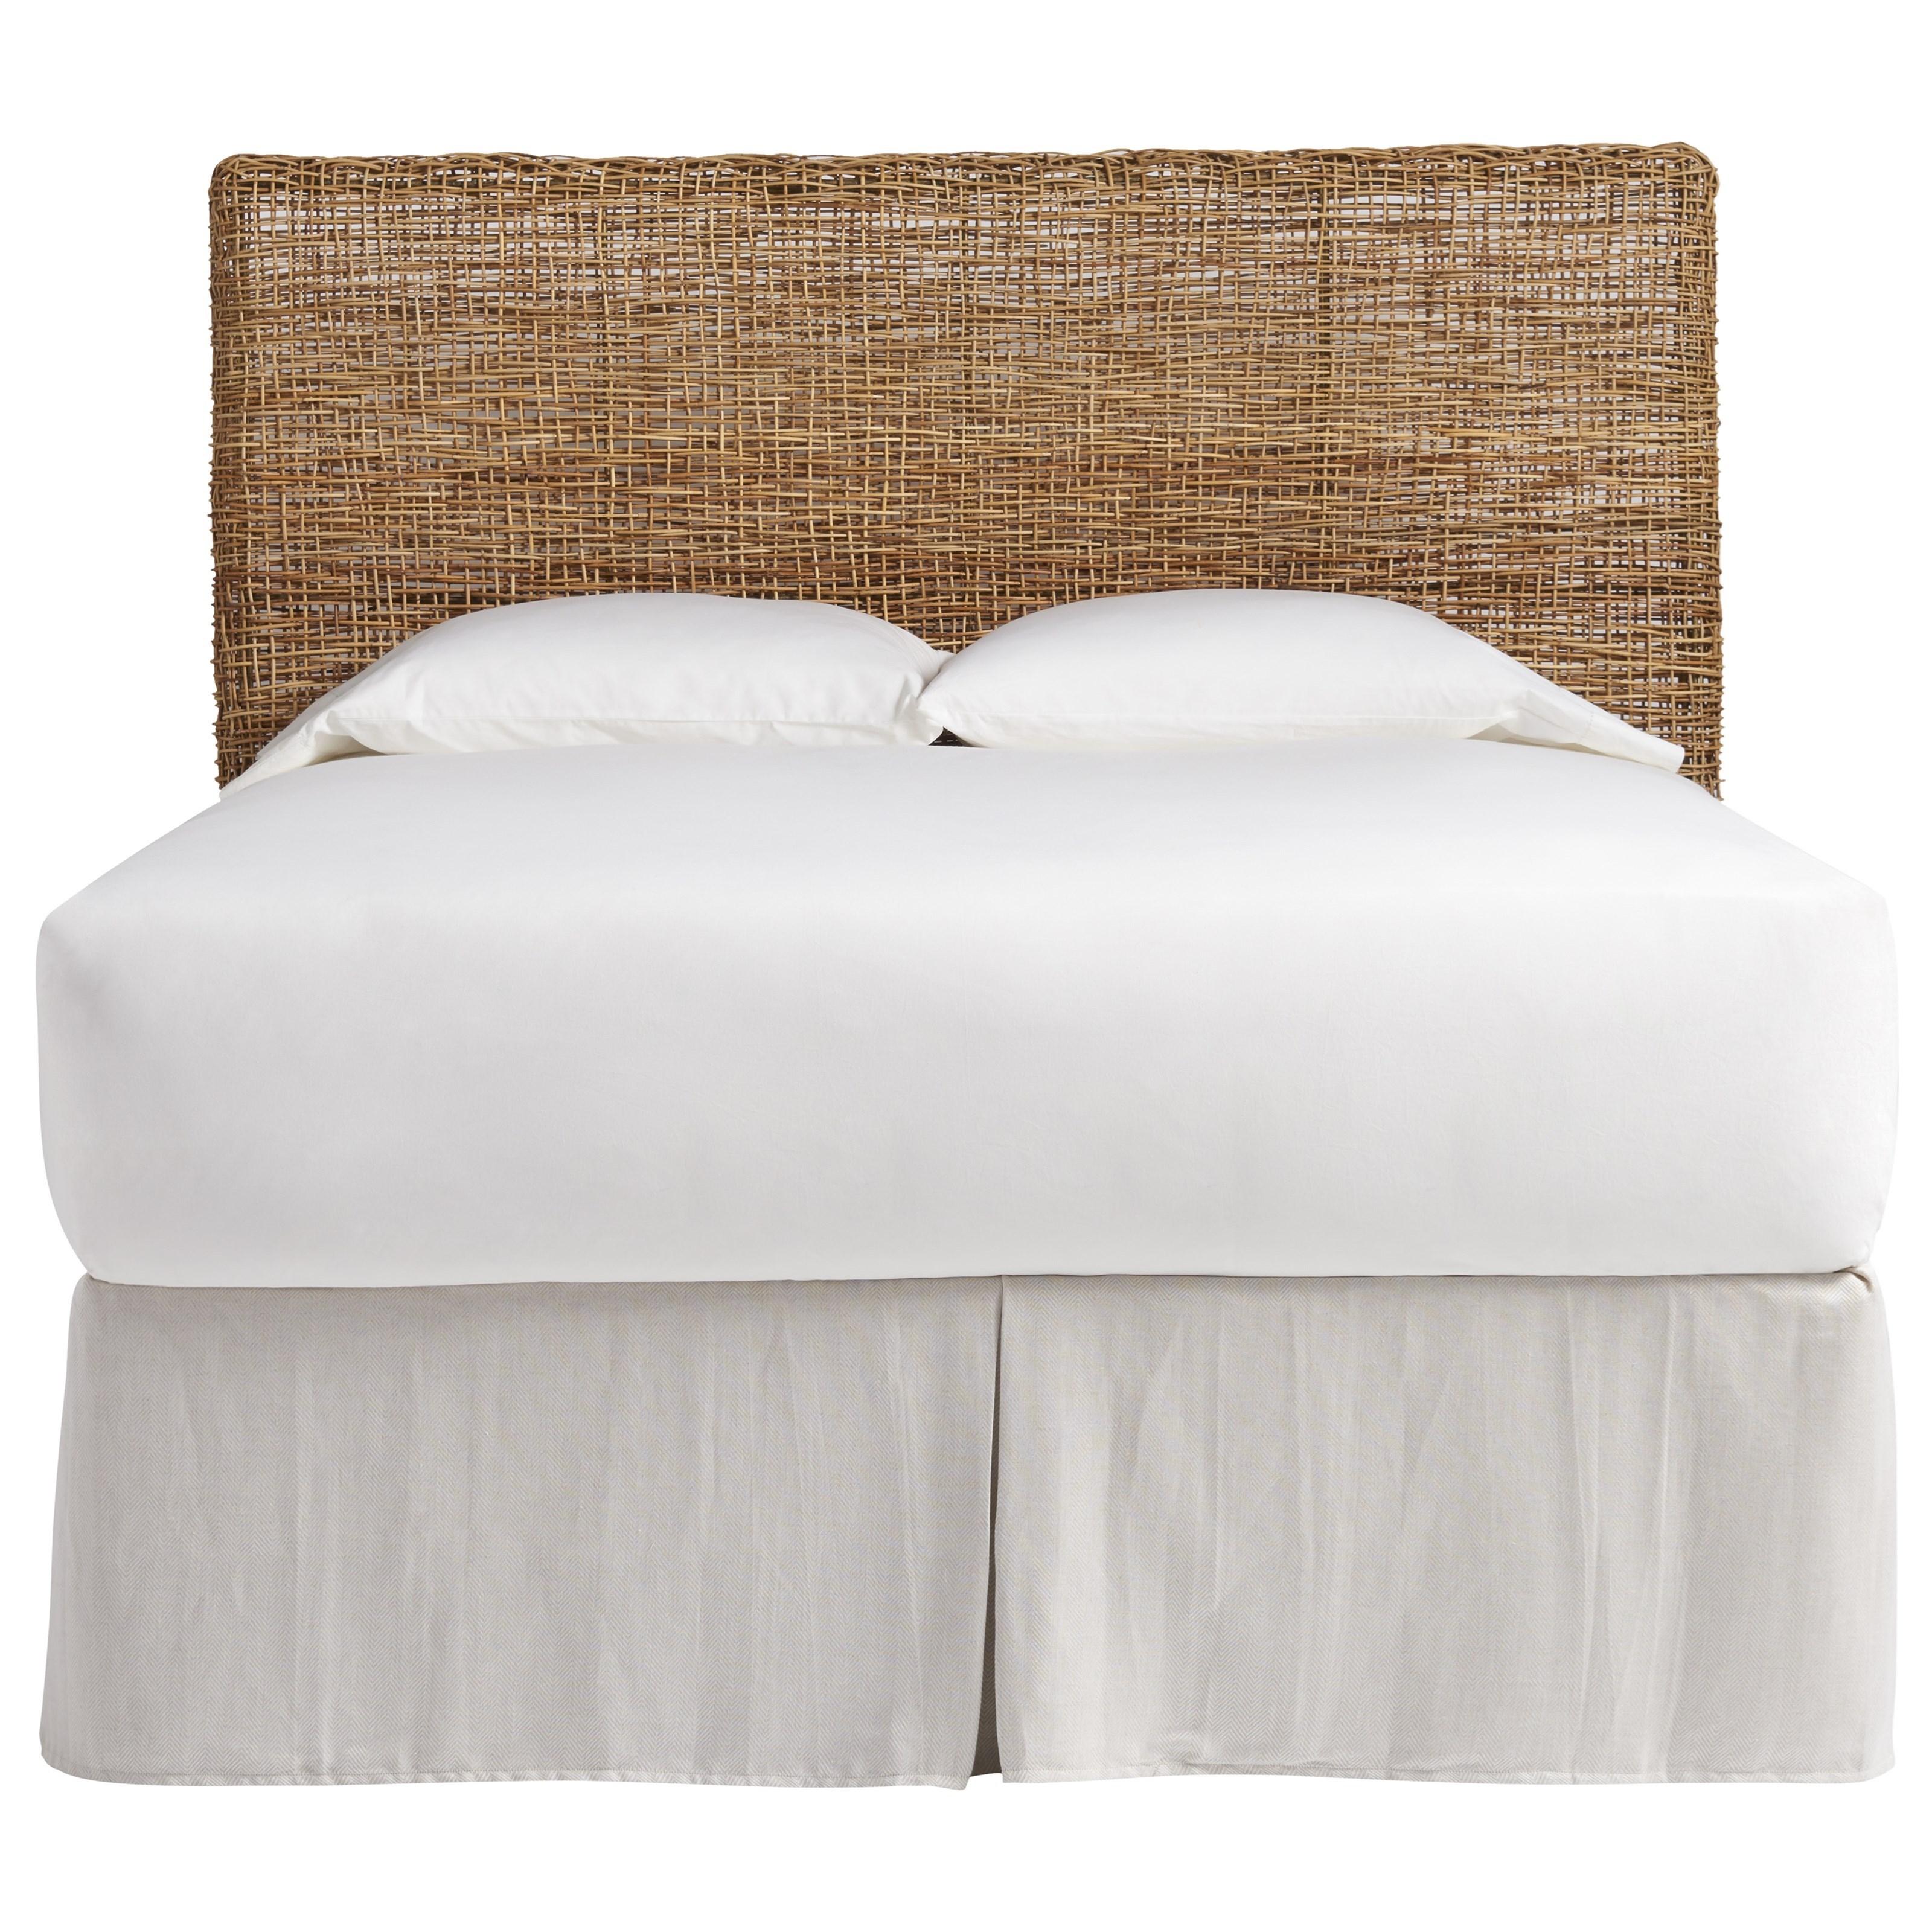 Coastal Living Home - Escape King/California King Headboard by Universal at HomeWorld Furniture